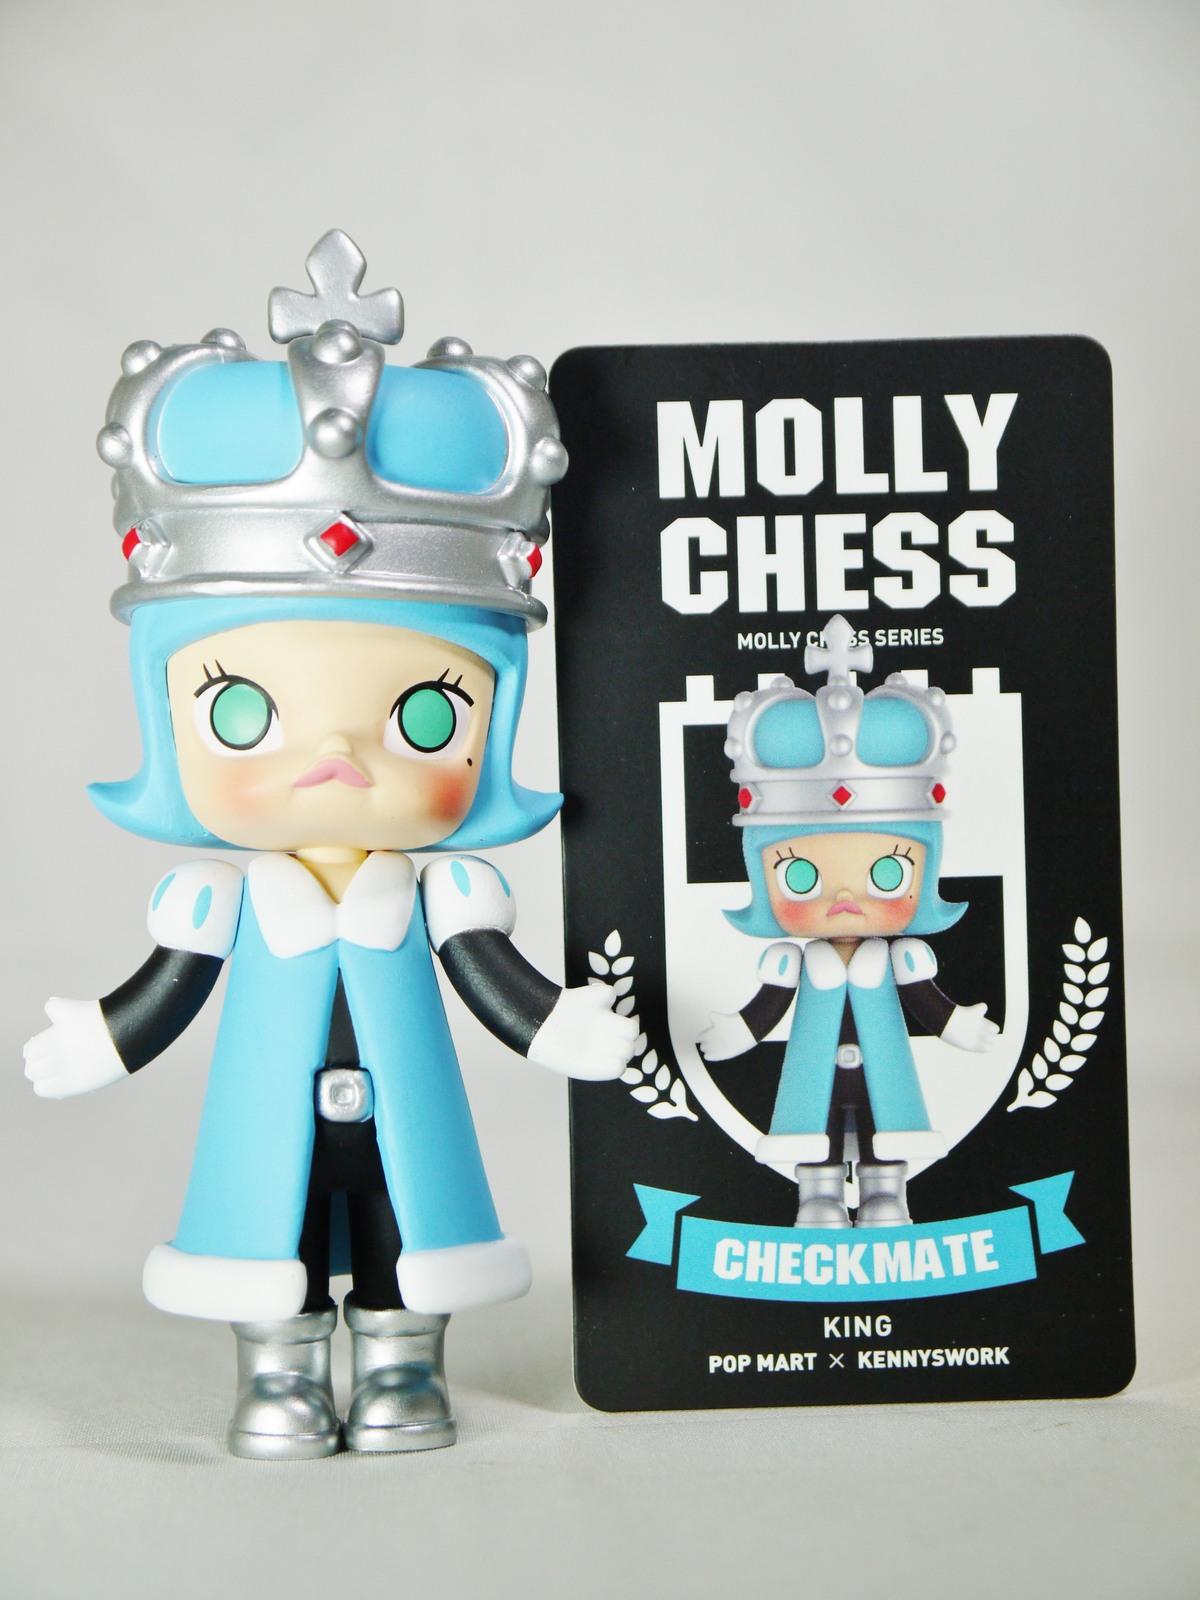 POP MART Kennyswork BLOCK Little Molly Chess Club Chessmate KING Blue